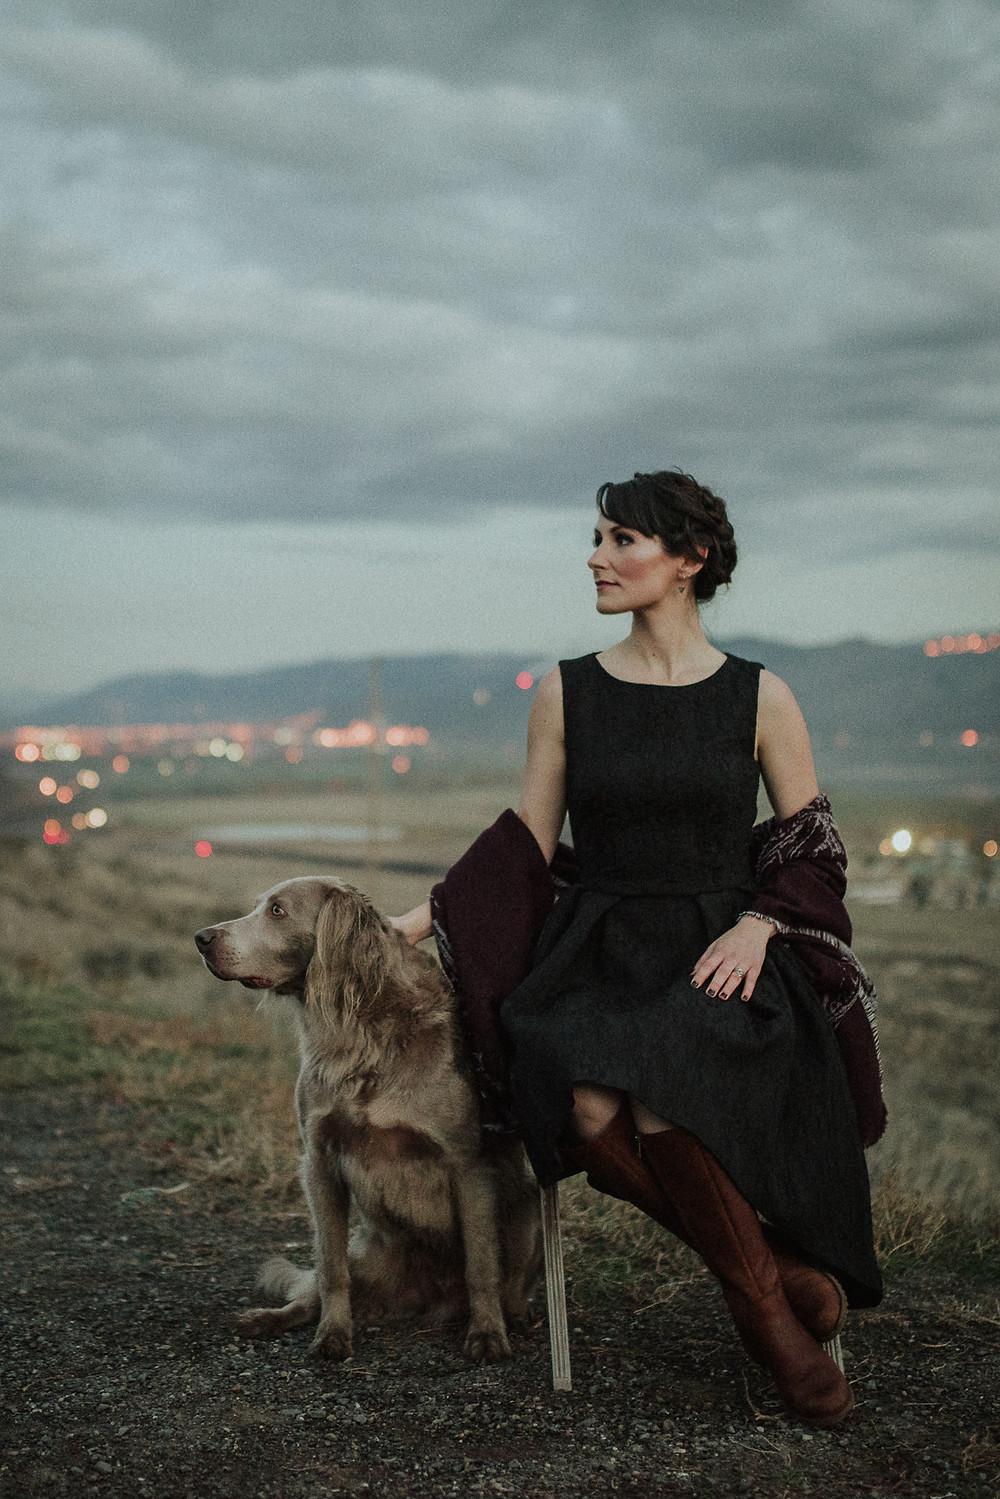 kamloops photographer woman with dog beyond city lights